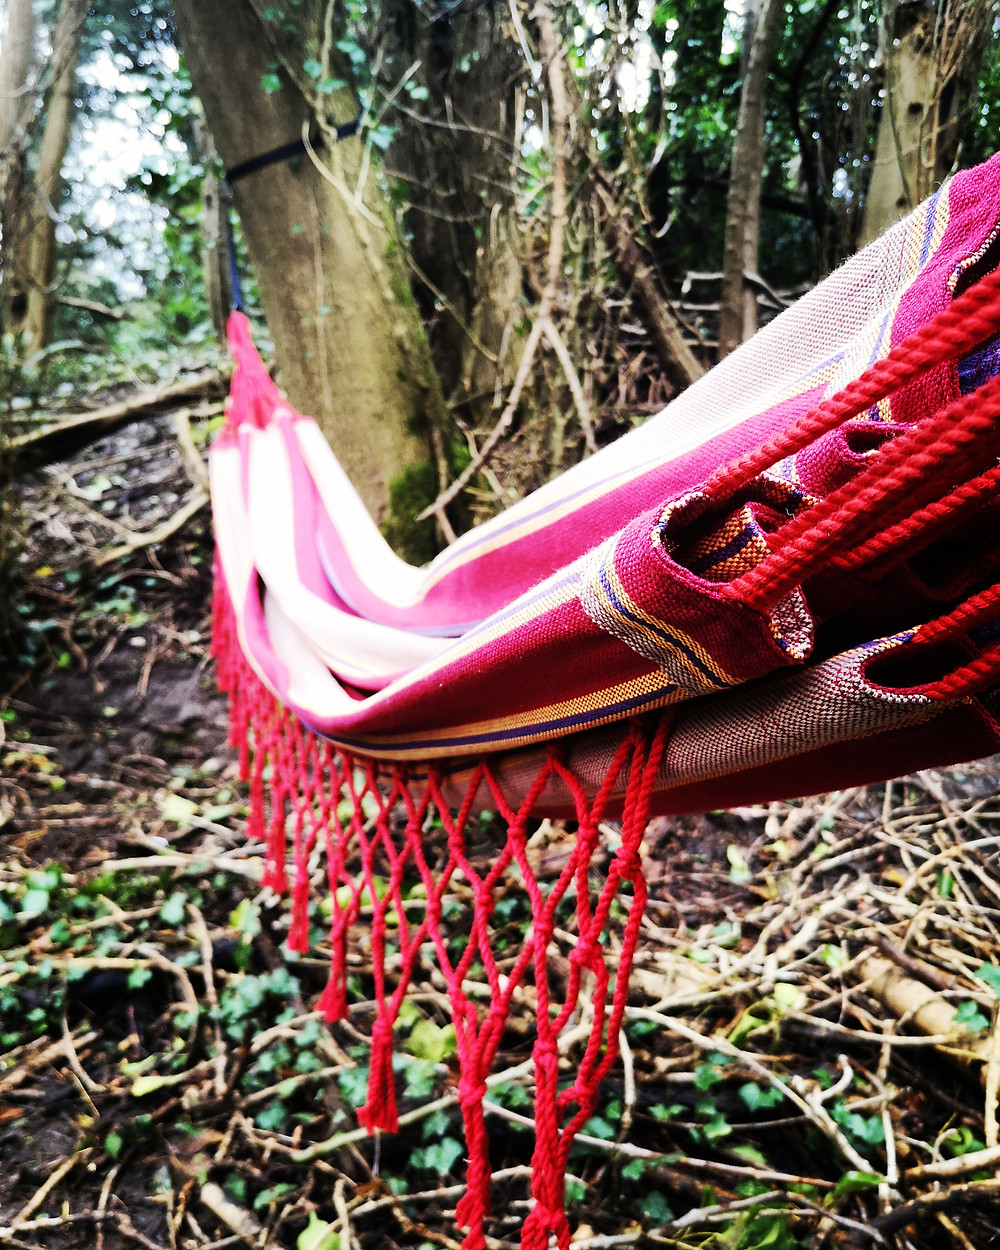 Tropliex hammock